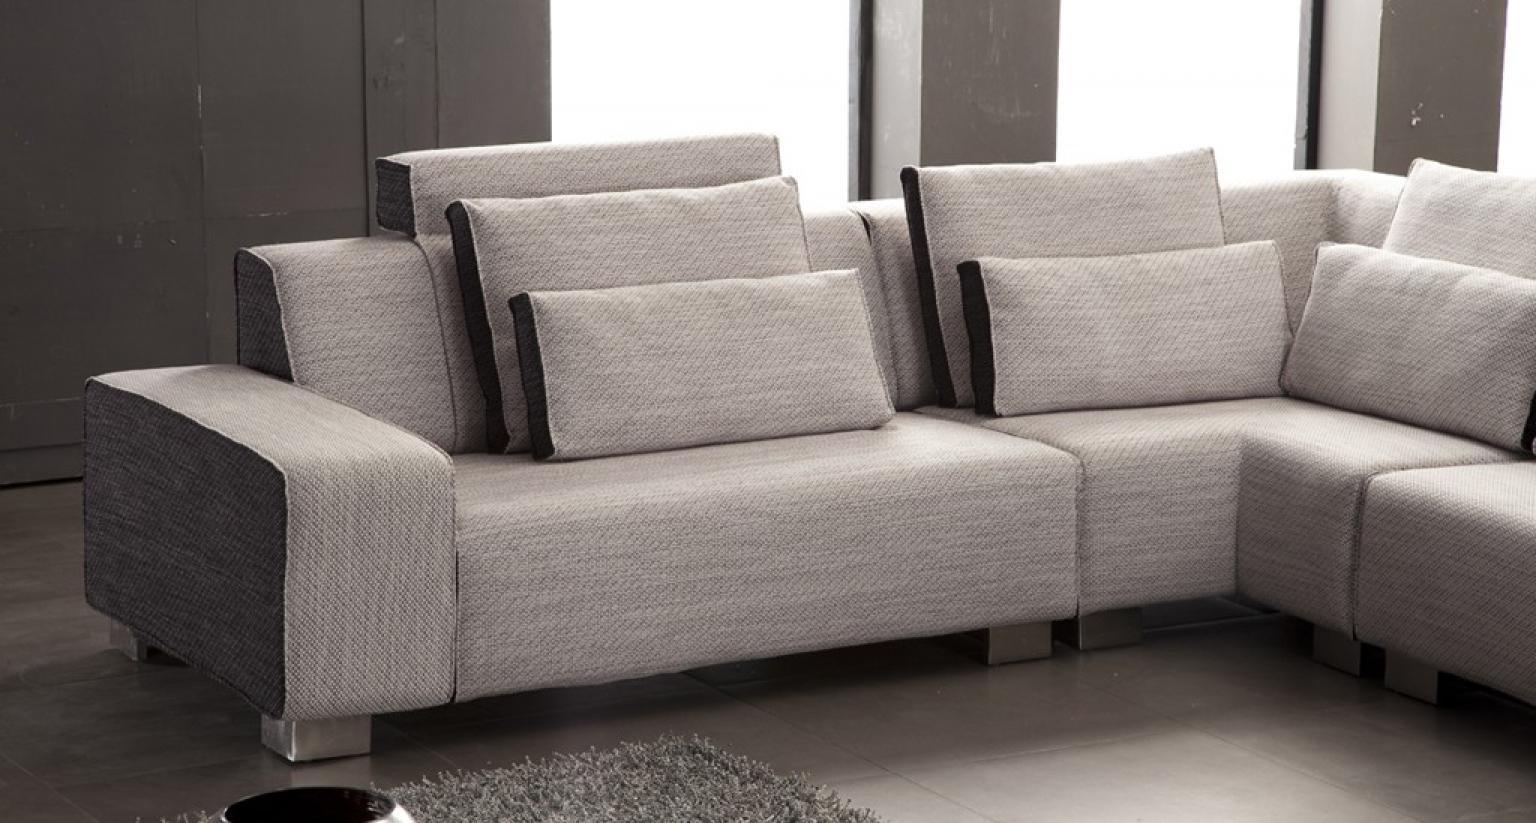 photos canap angle tissu. Black Bedroom Furniture Sets. Home Design Ideas